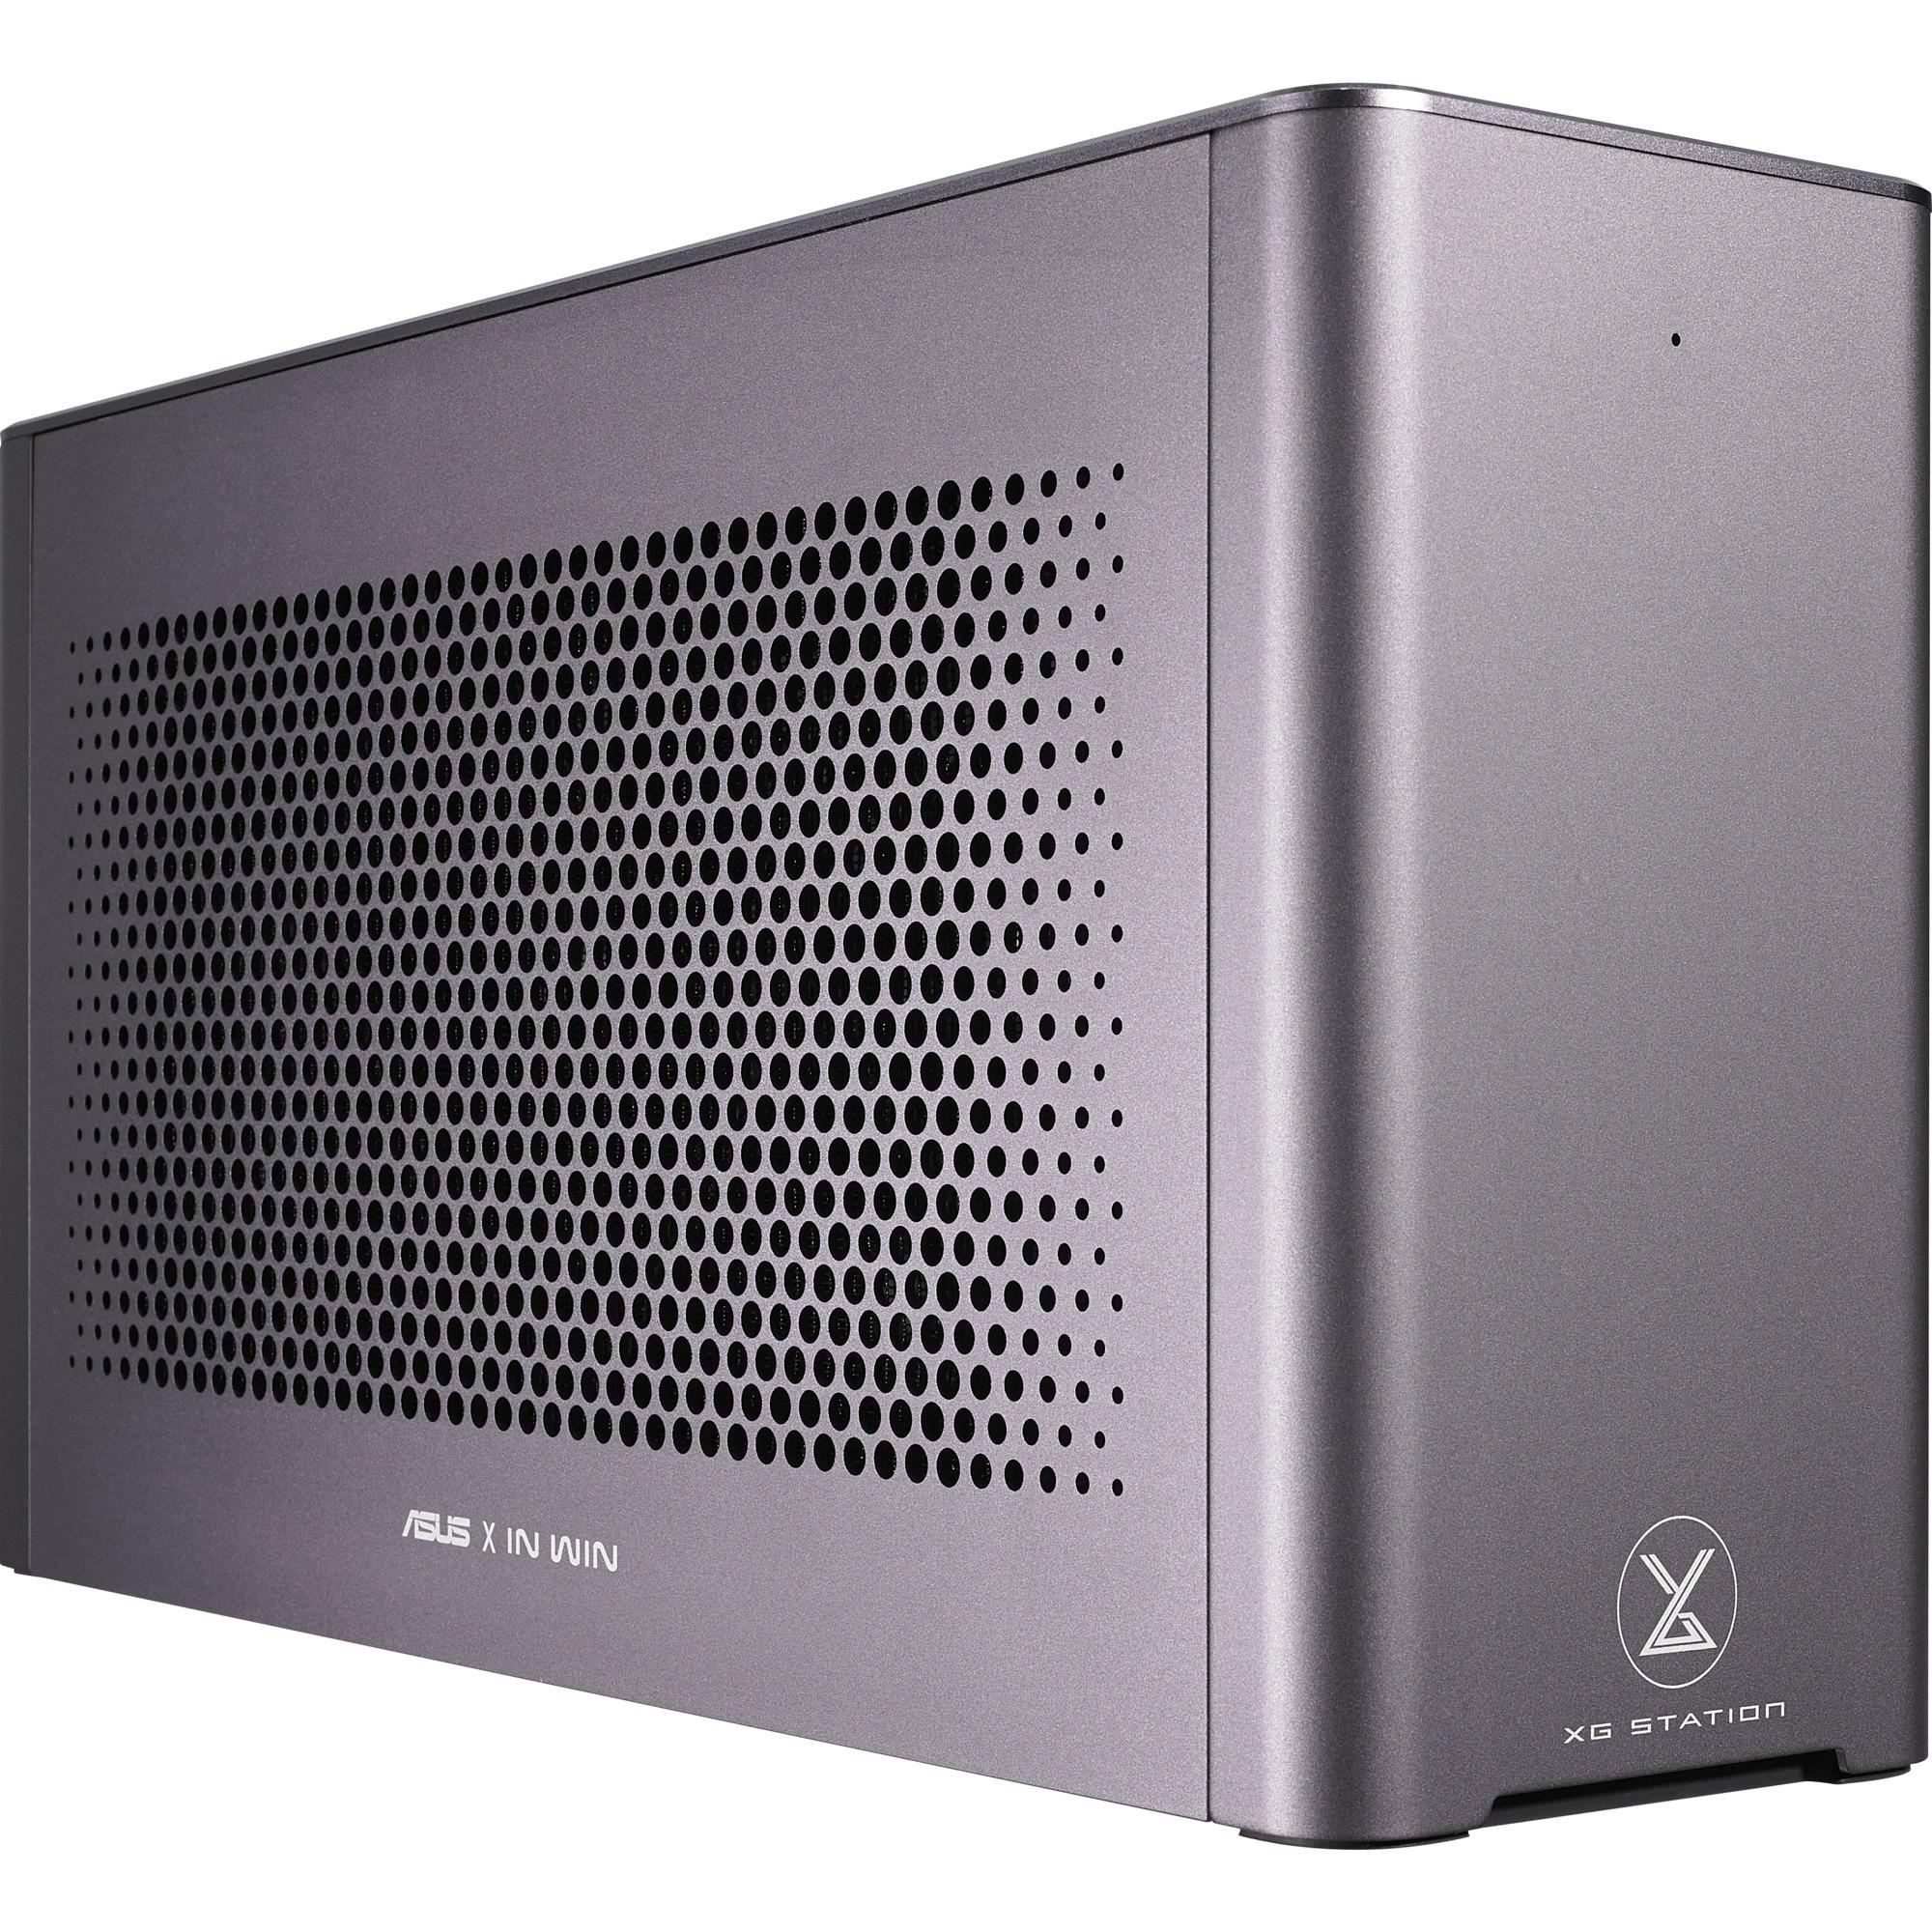 XG Station Pro PCIe tarjeta y adaptador de interfaz, Caja/Carcasa